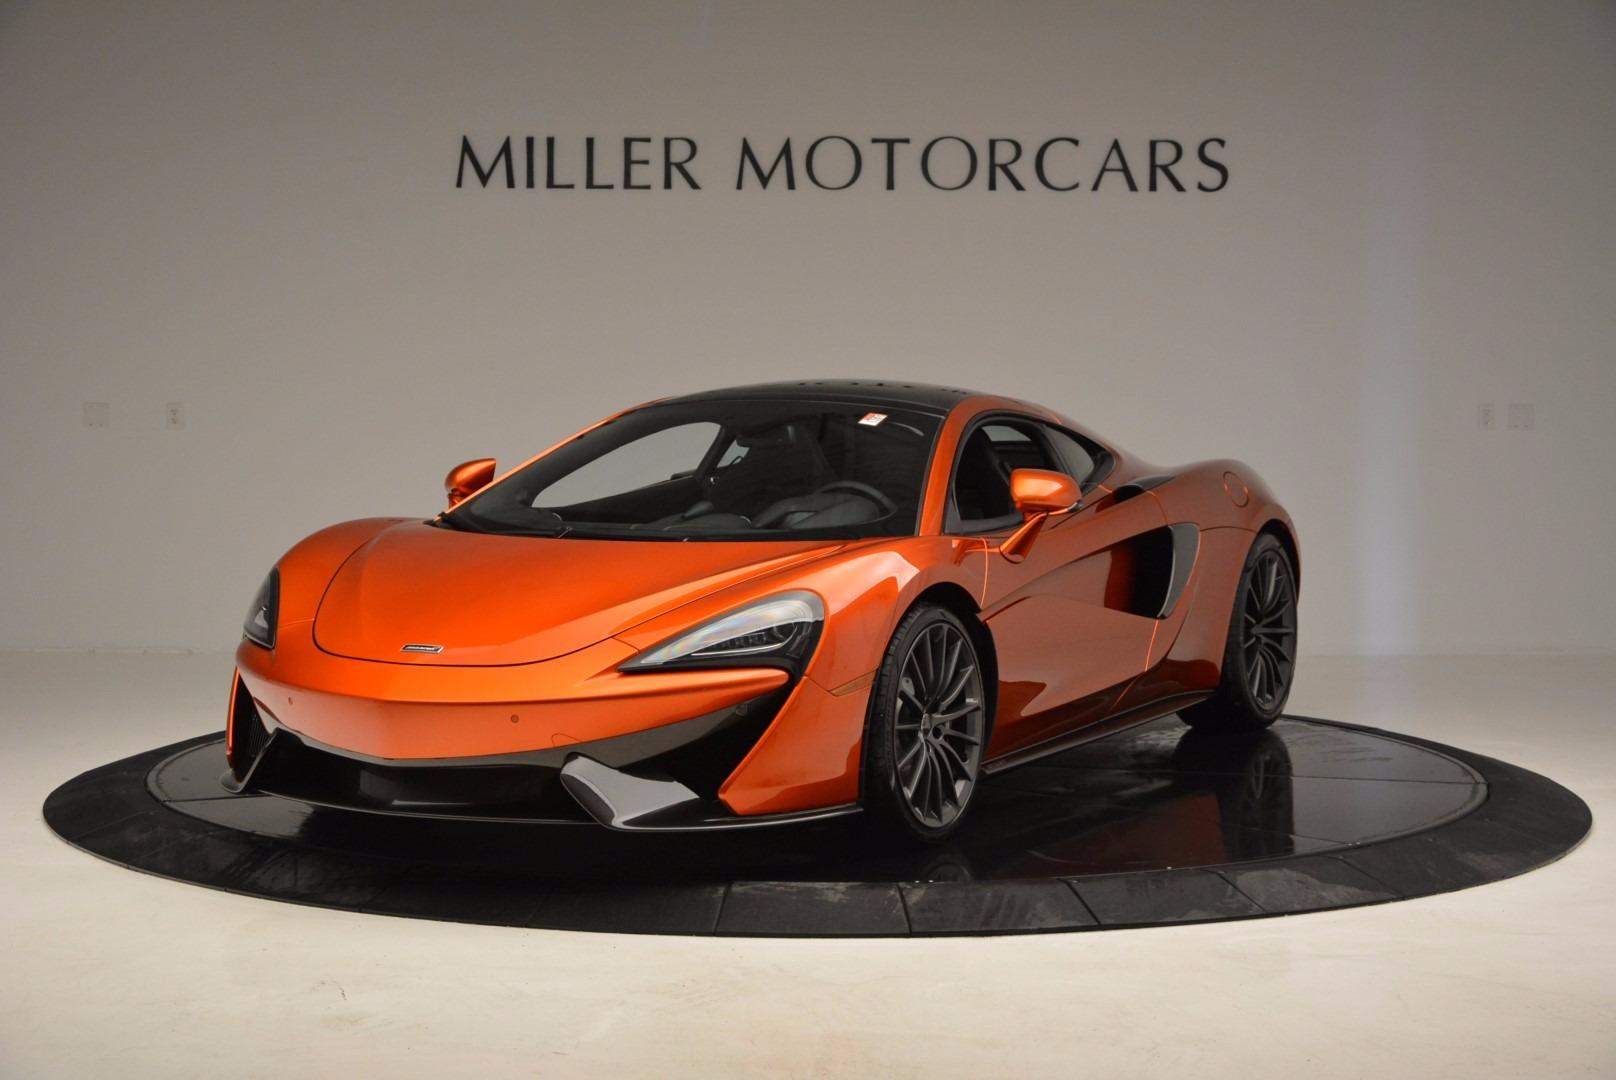 Used 2017 McLaren 570GT Coupe for sale $145,900 at Maserati of Westport in Westport CT 06880 1